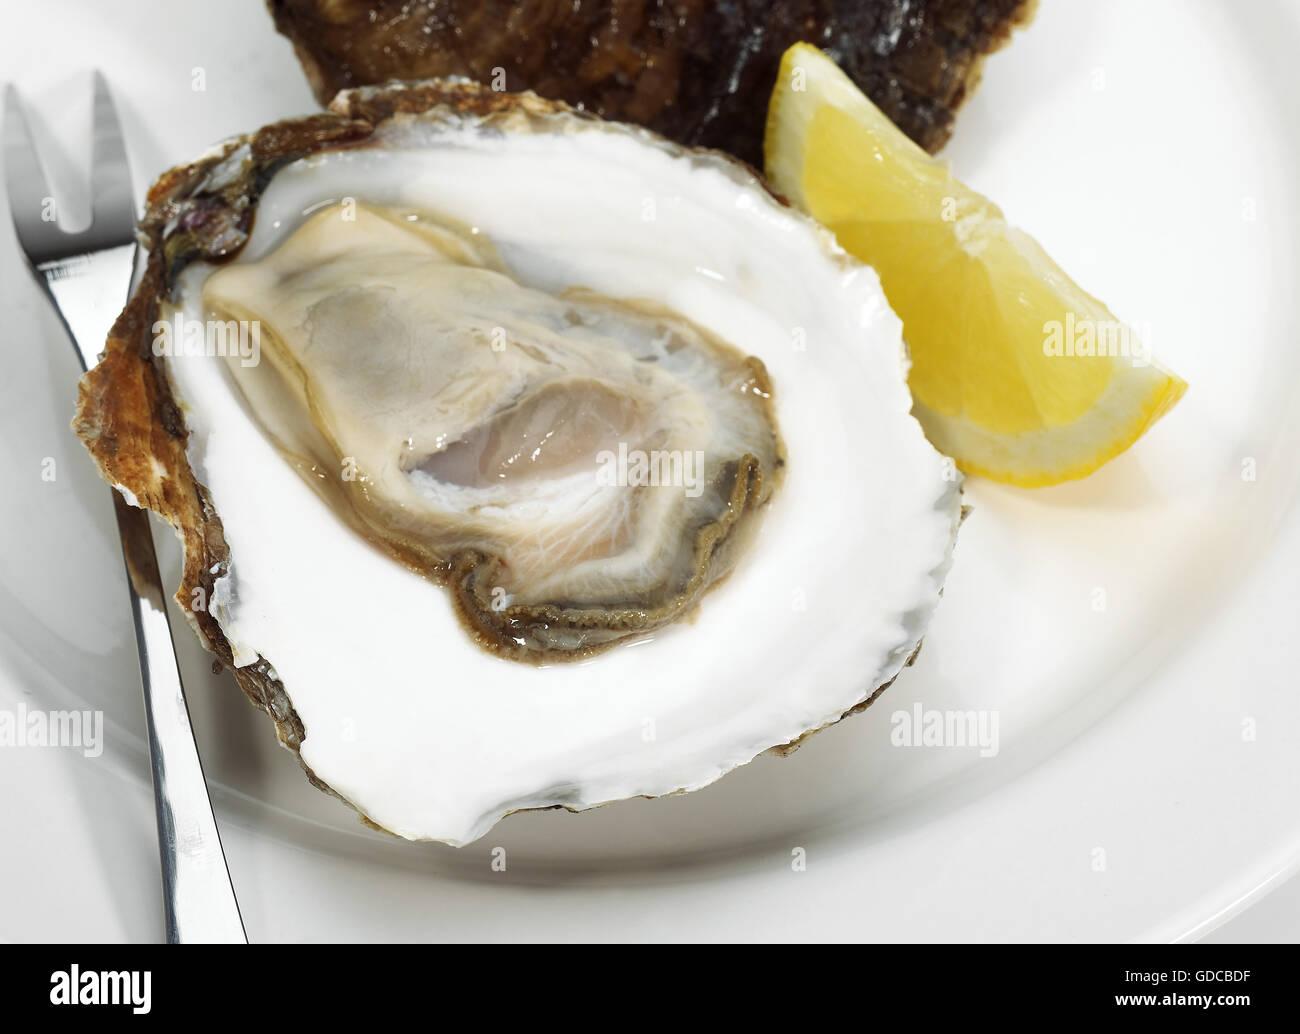 french belon oyster stockfotos french belon oyster bilder alamy. Black Bedroom Furniture Sets. Home Design Ideas